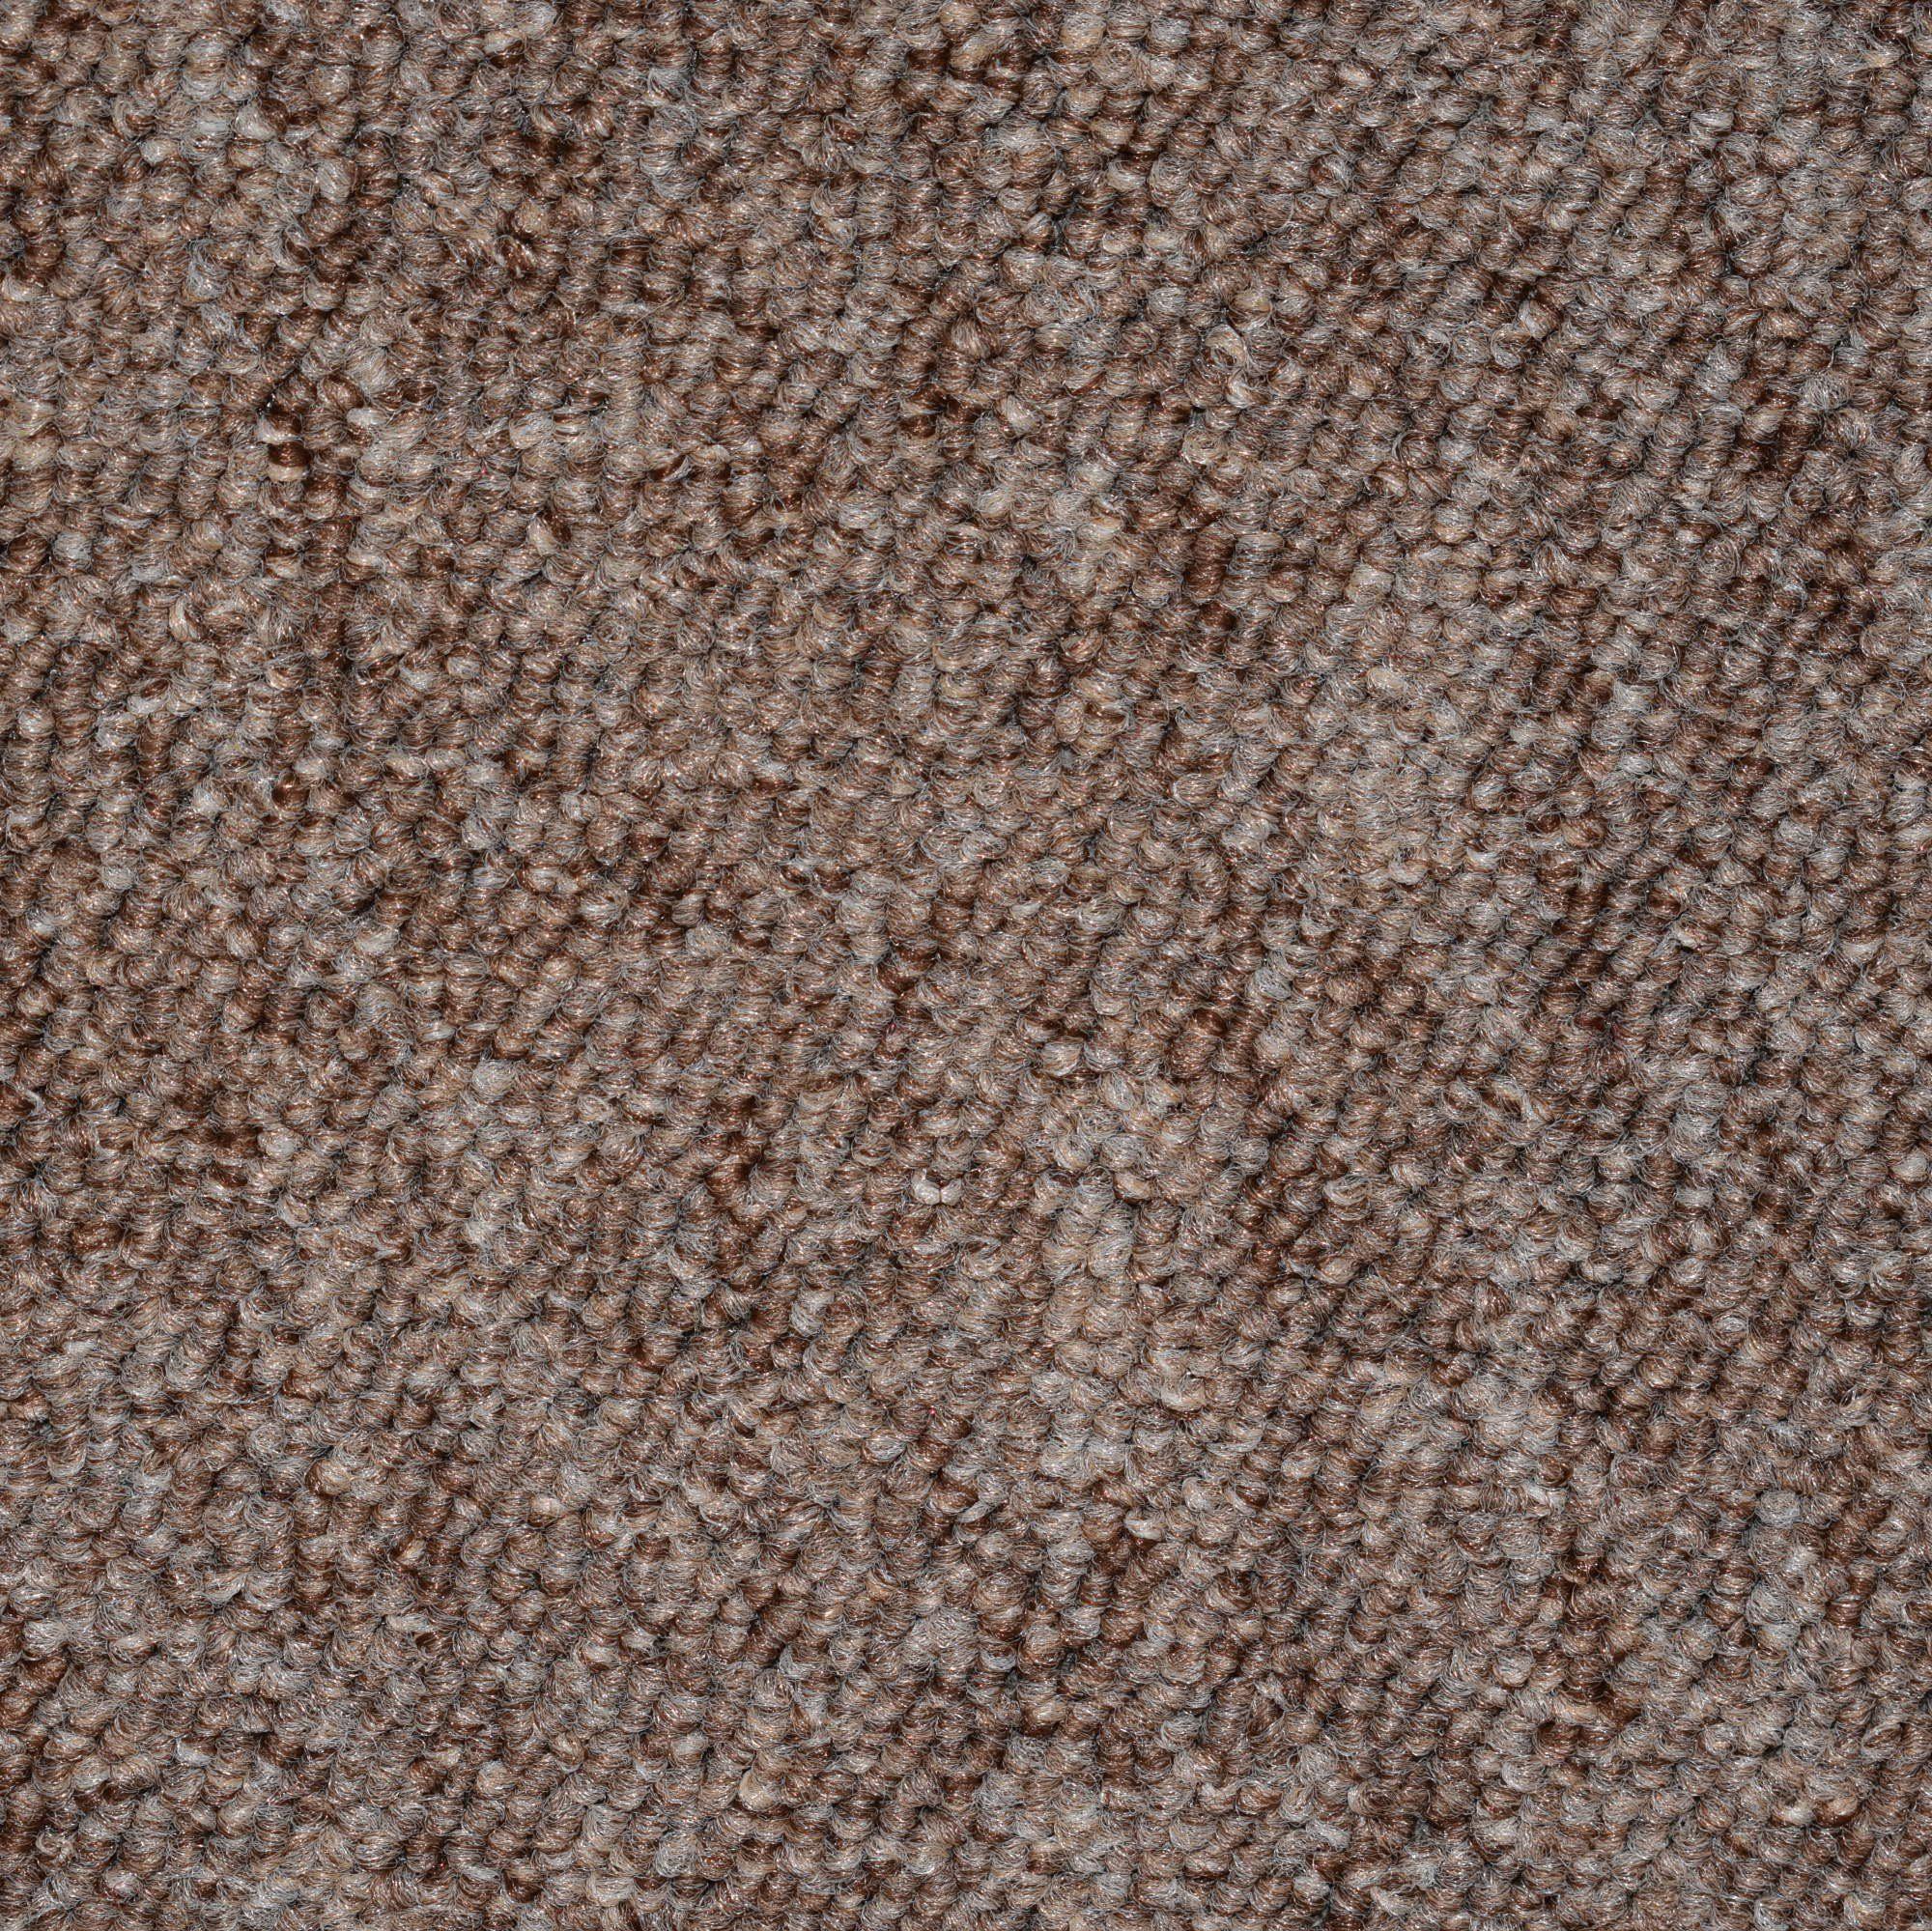 Teppichfliese »Neapel sand«, 4 Stück (1 m²), selbstliegend